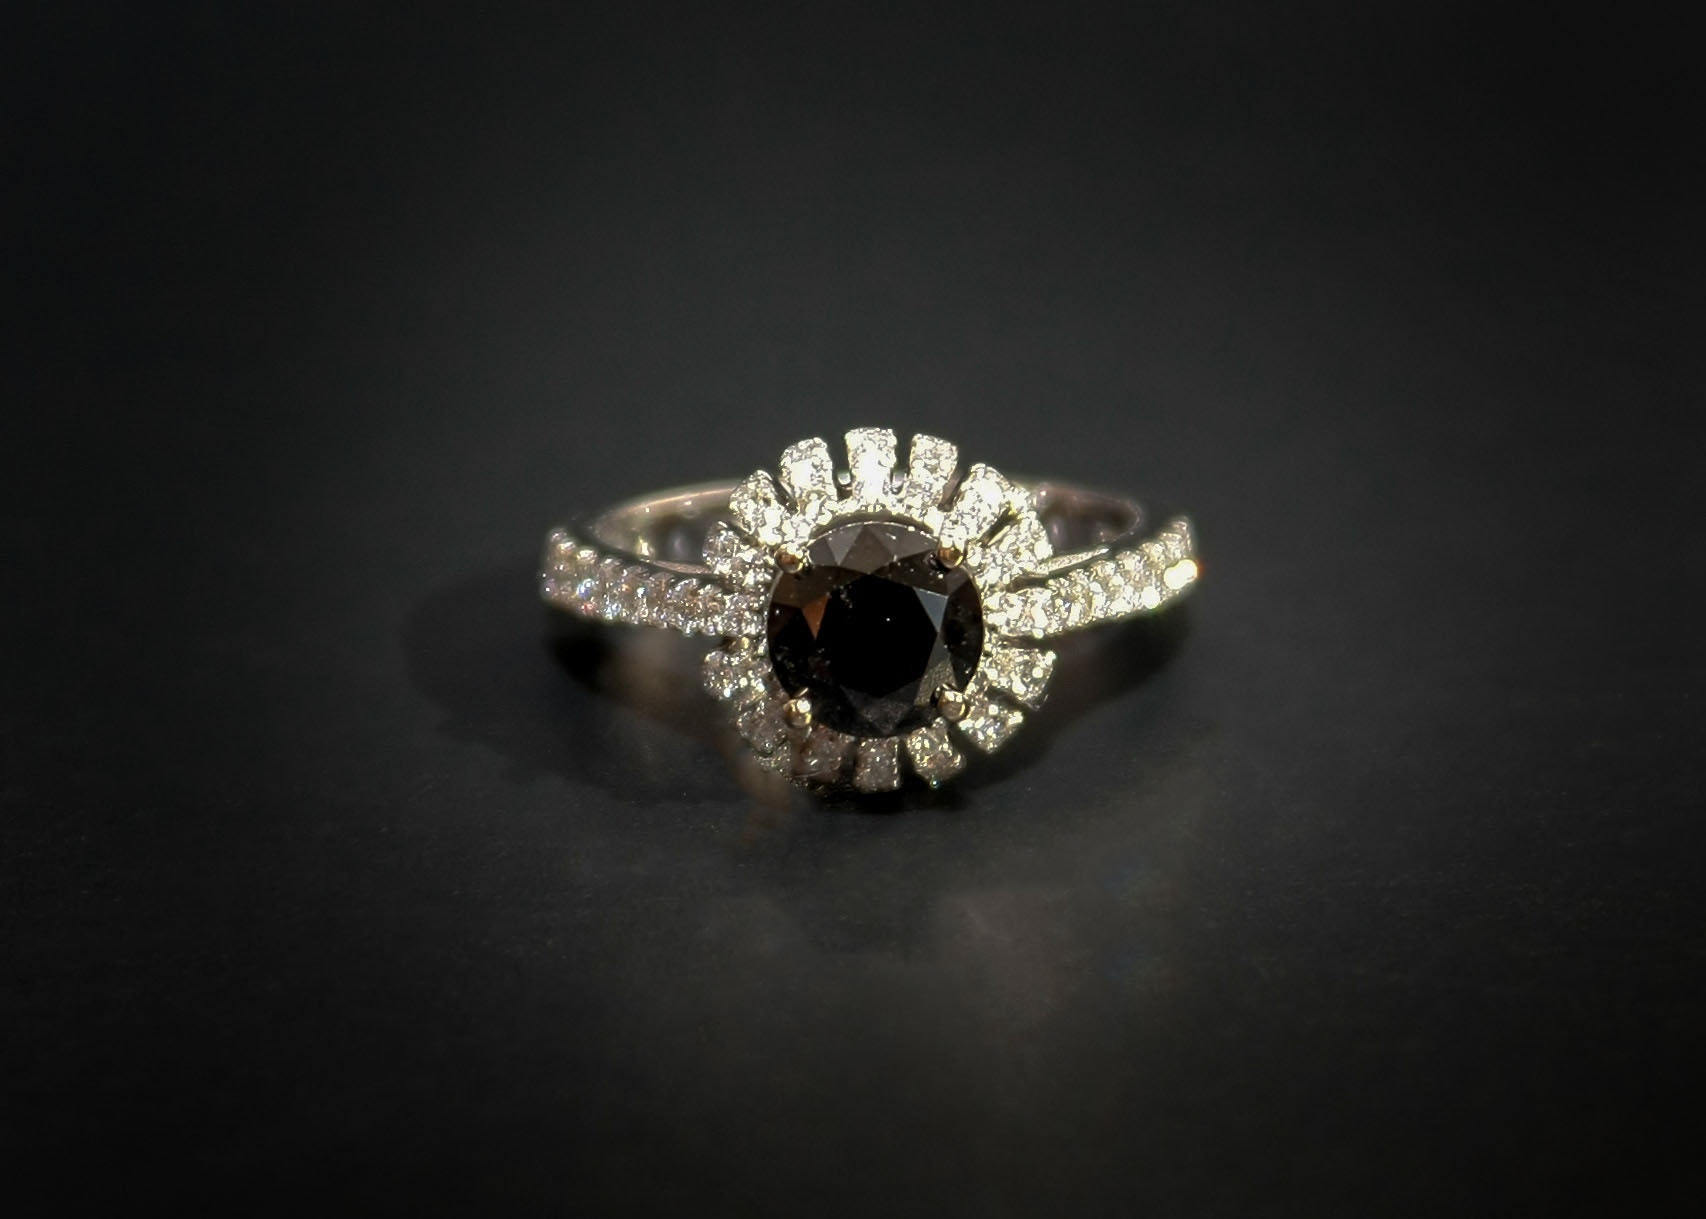 18K White Gold and Black Diamond Ring